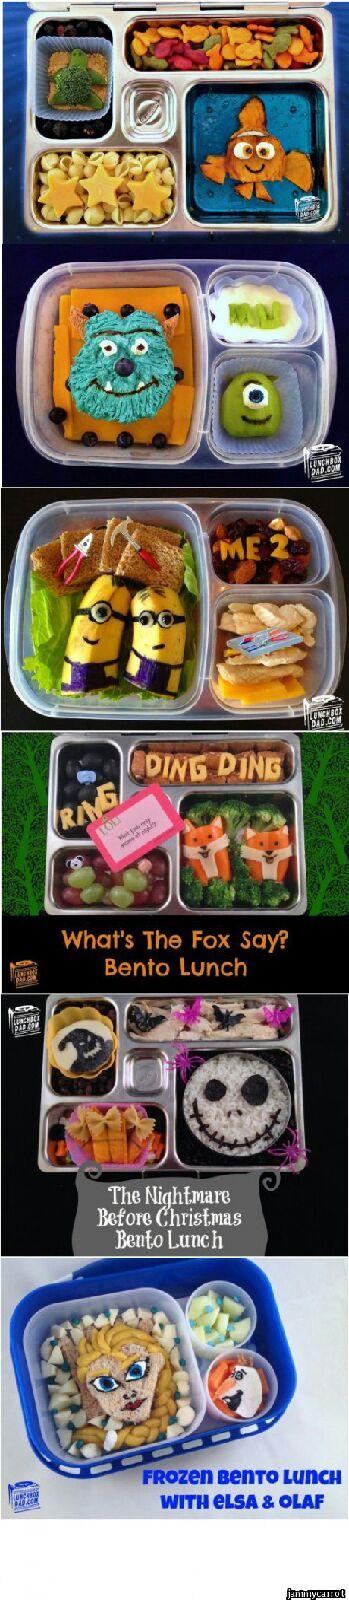 Cute food idea for kiddos